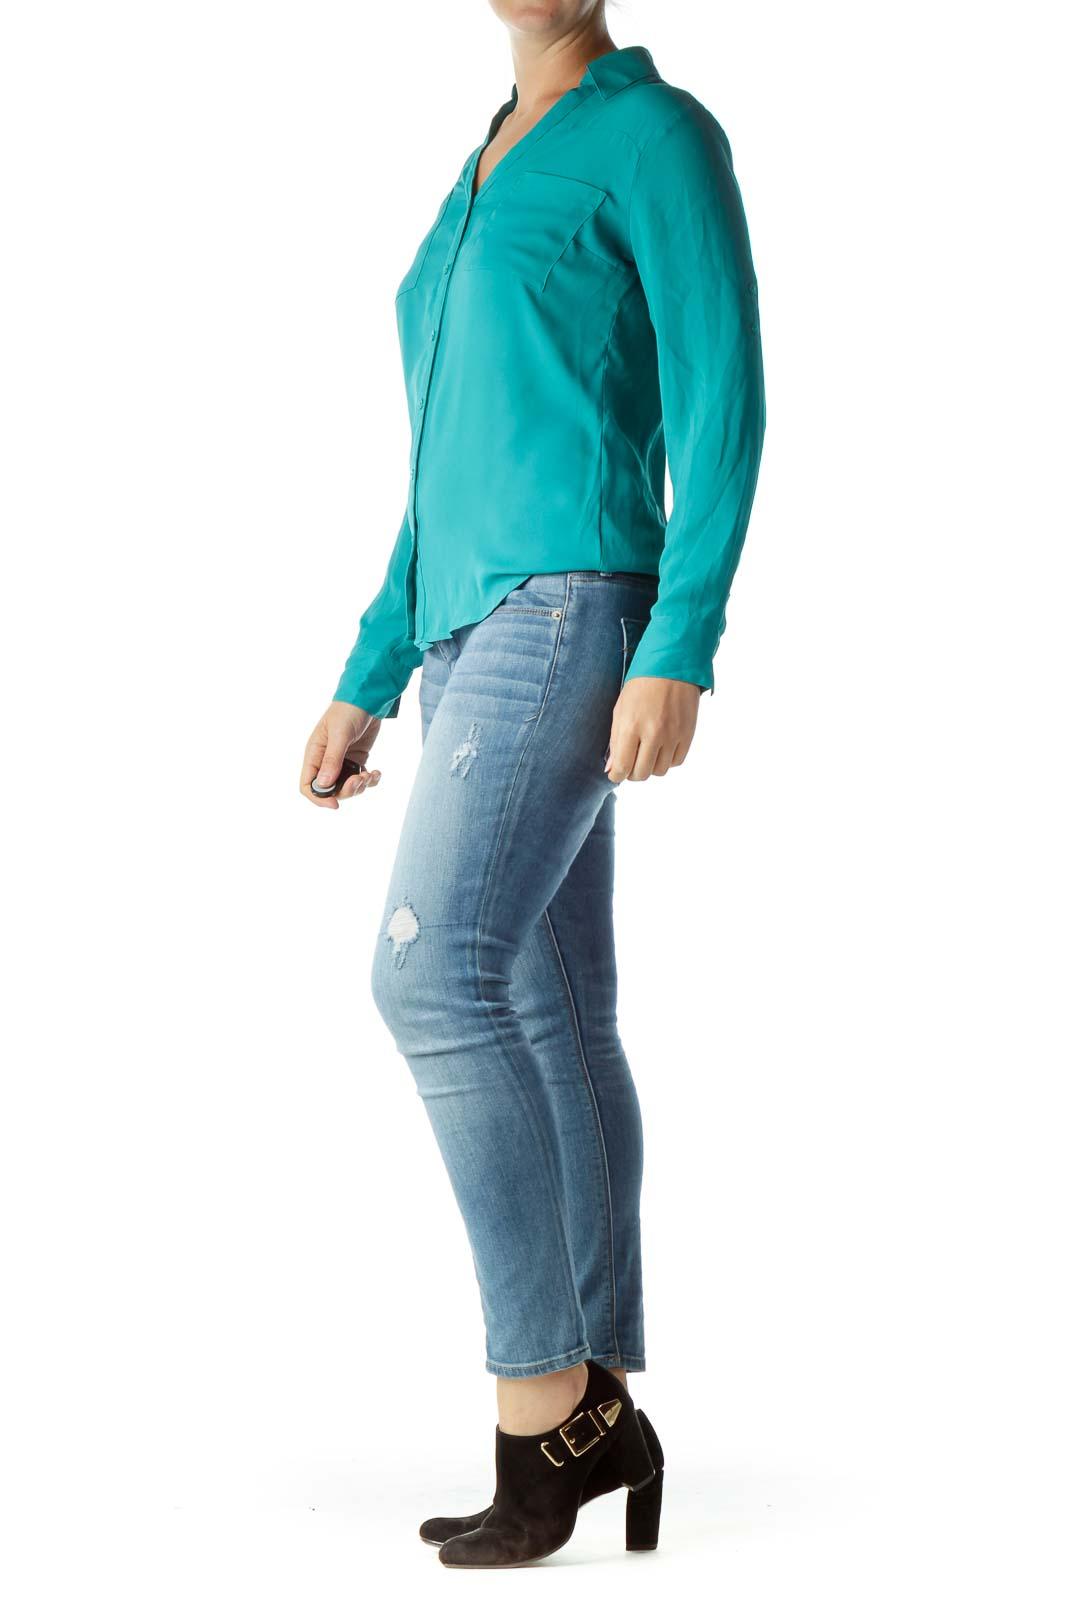 Green Buttoned Collared Shirt